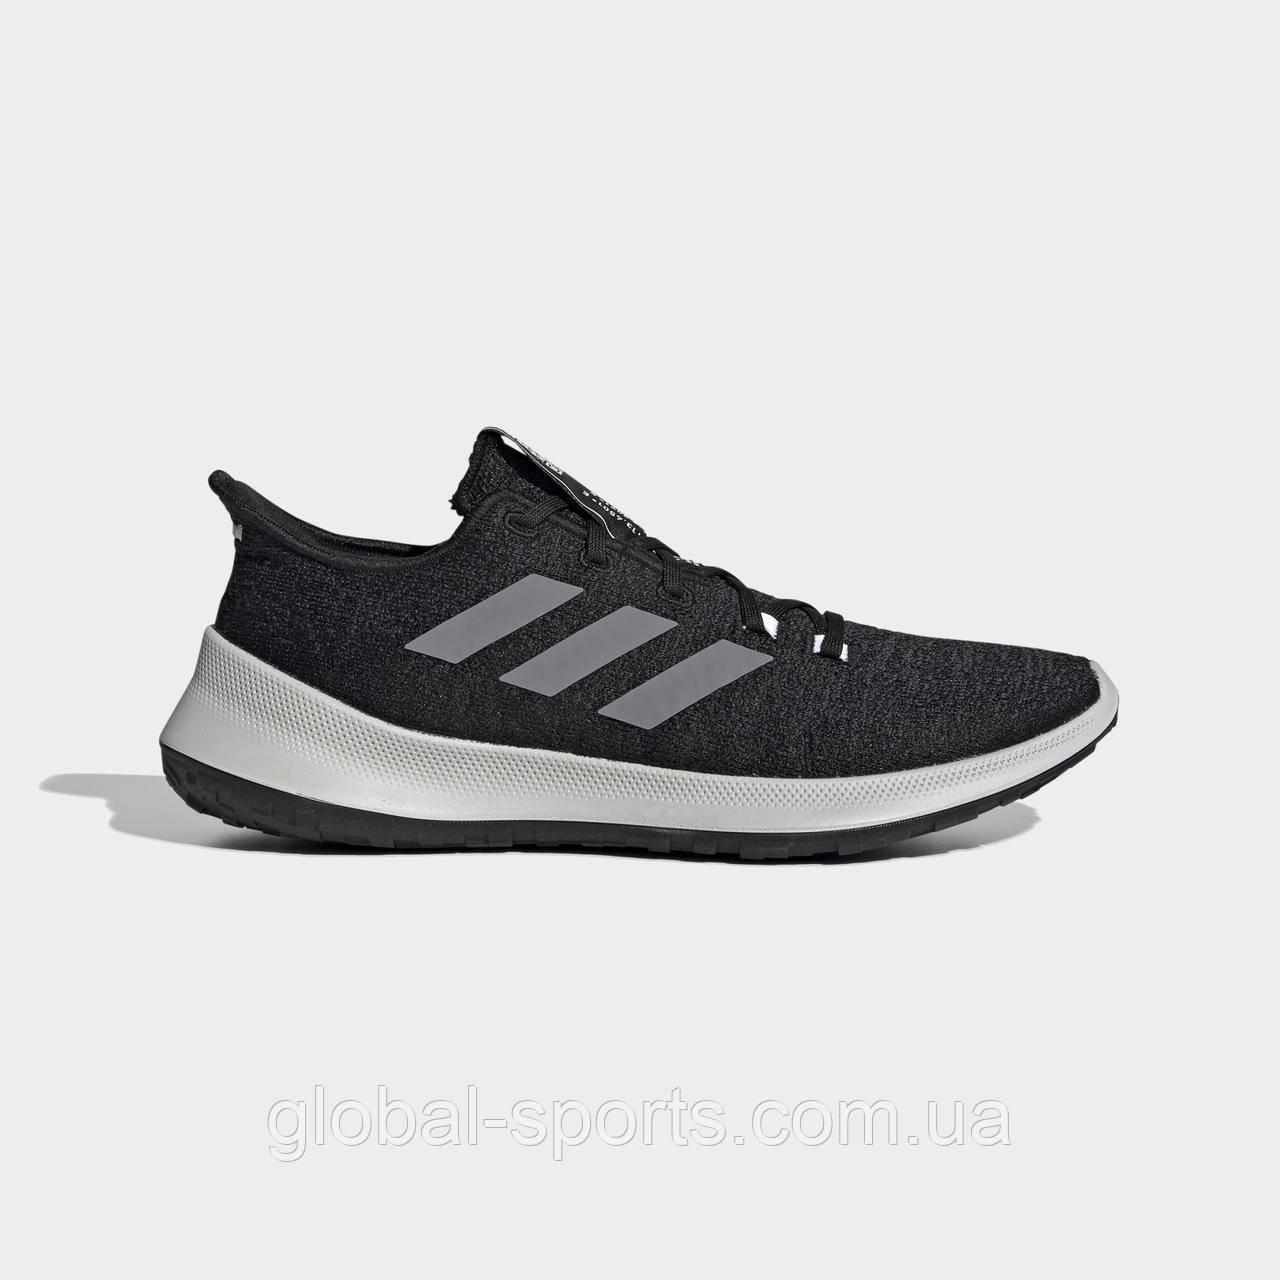 Мужские кроссовки Adidas Purebounce+(Артикул:G27364 )